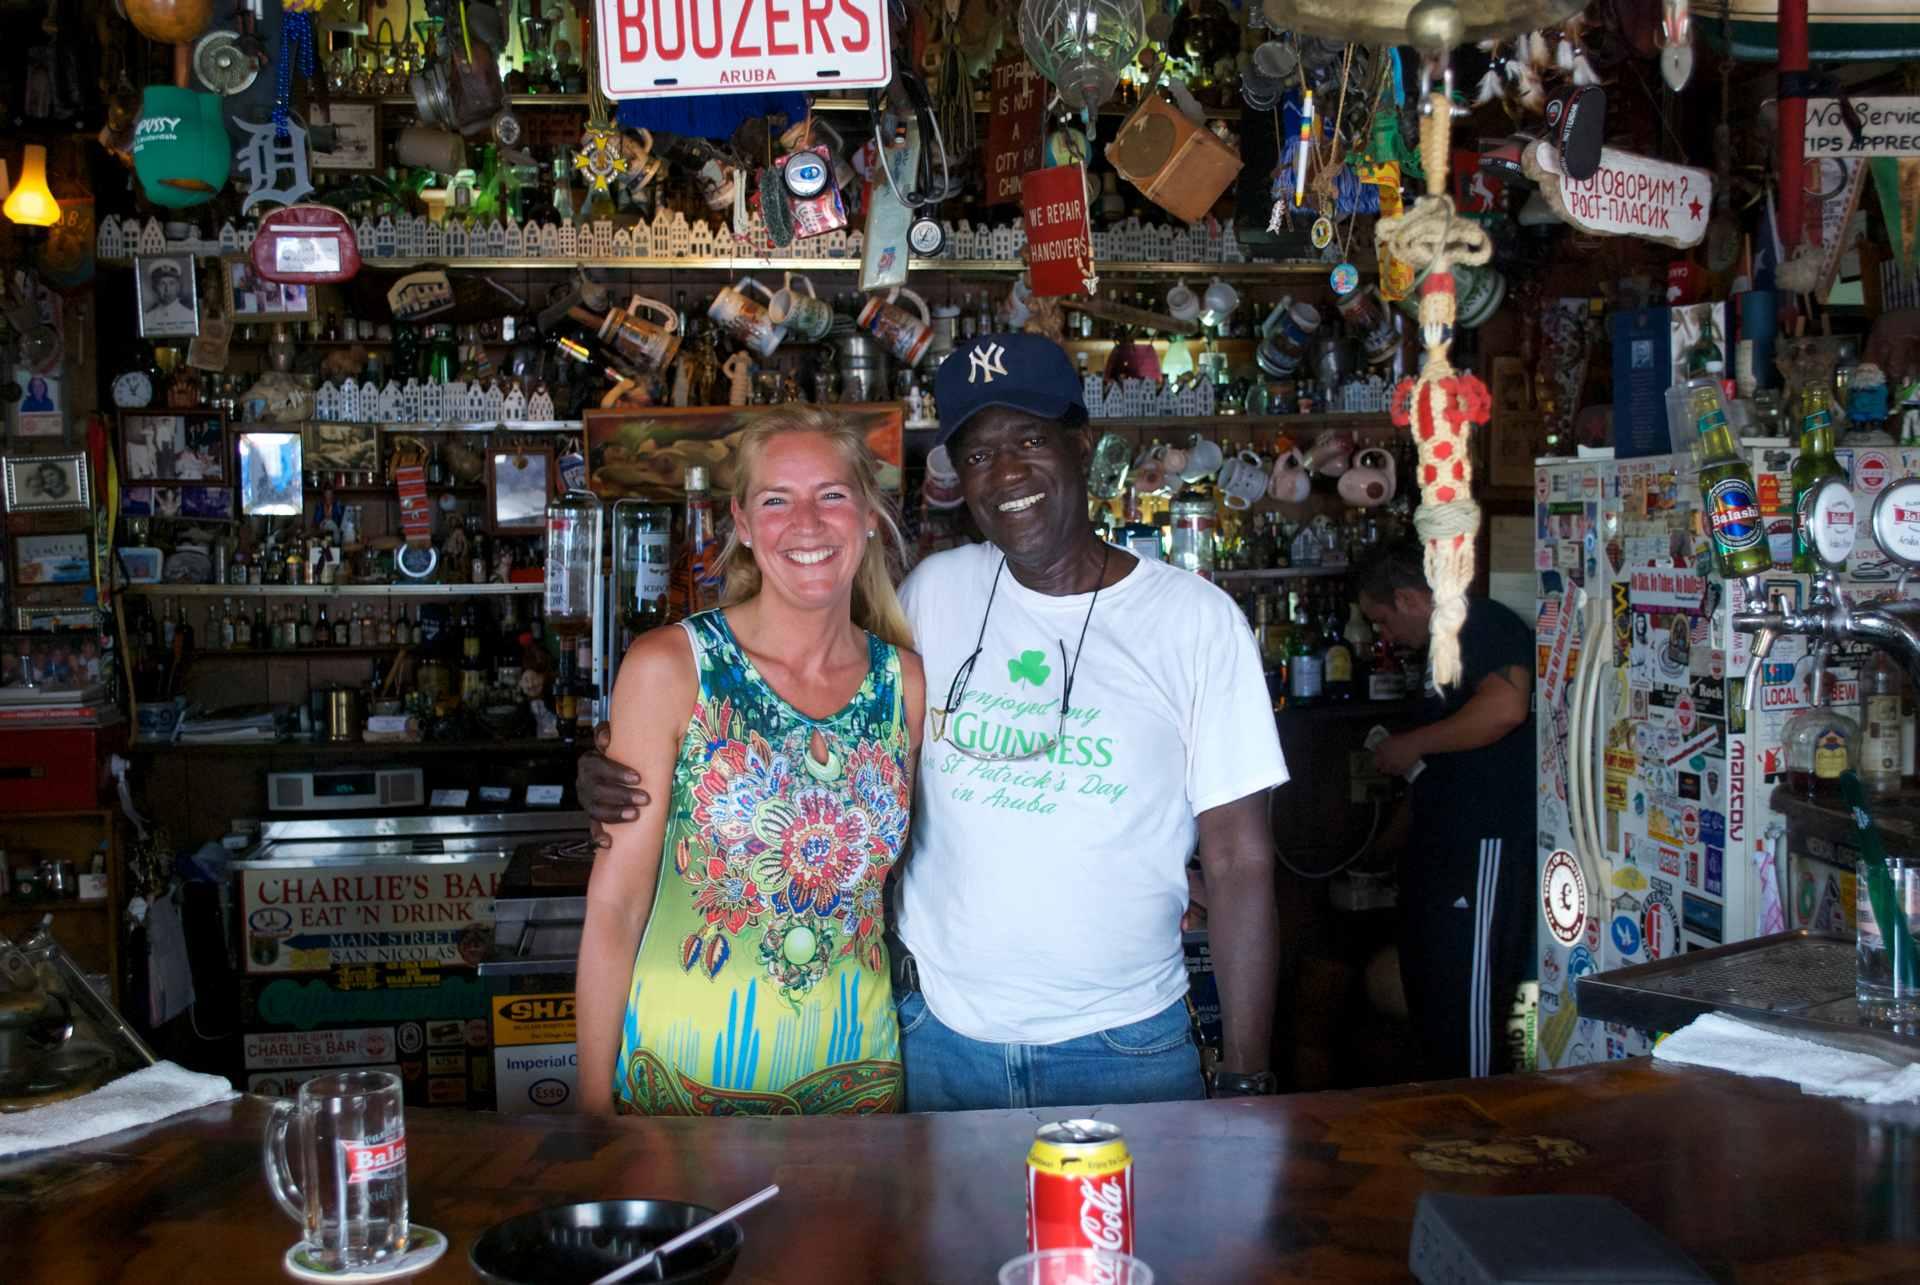 charlies bar aruba monique kupras